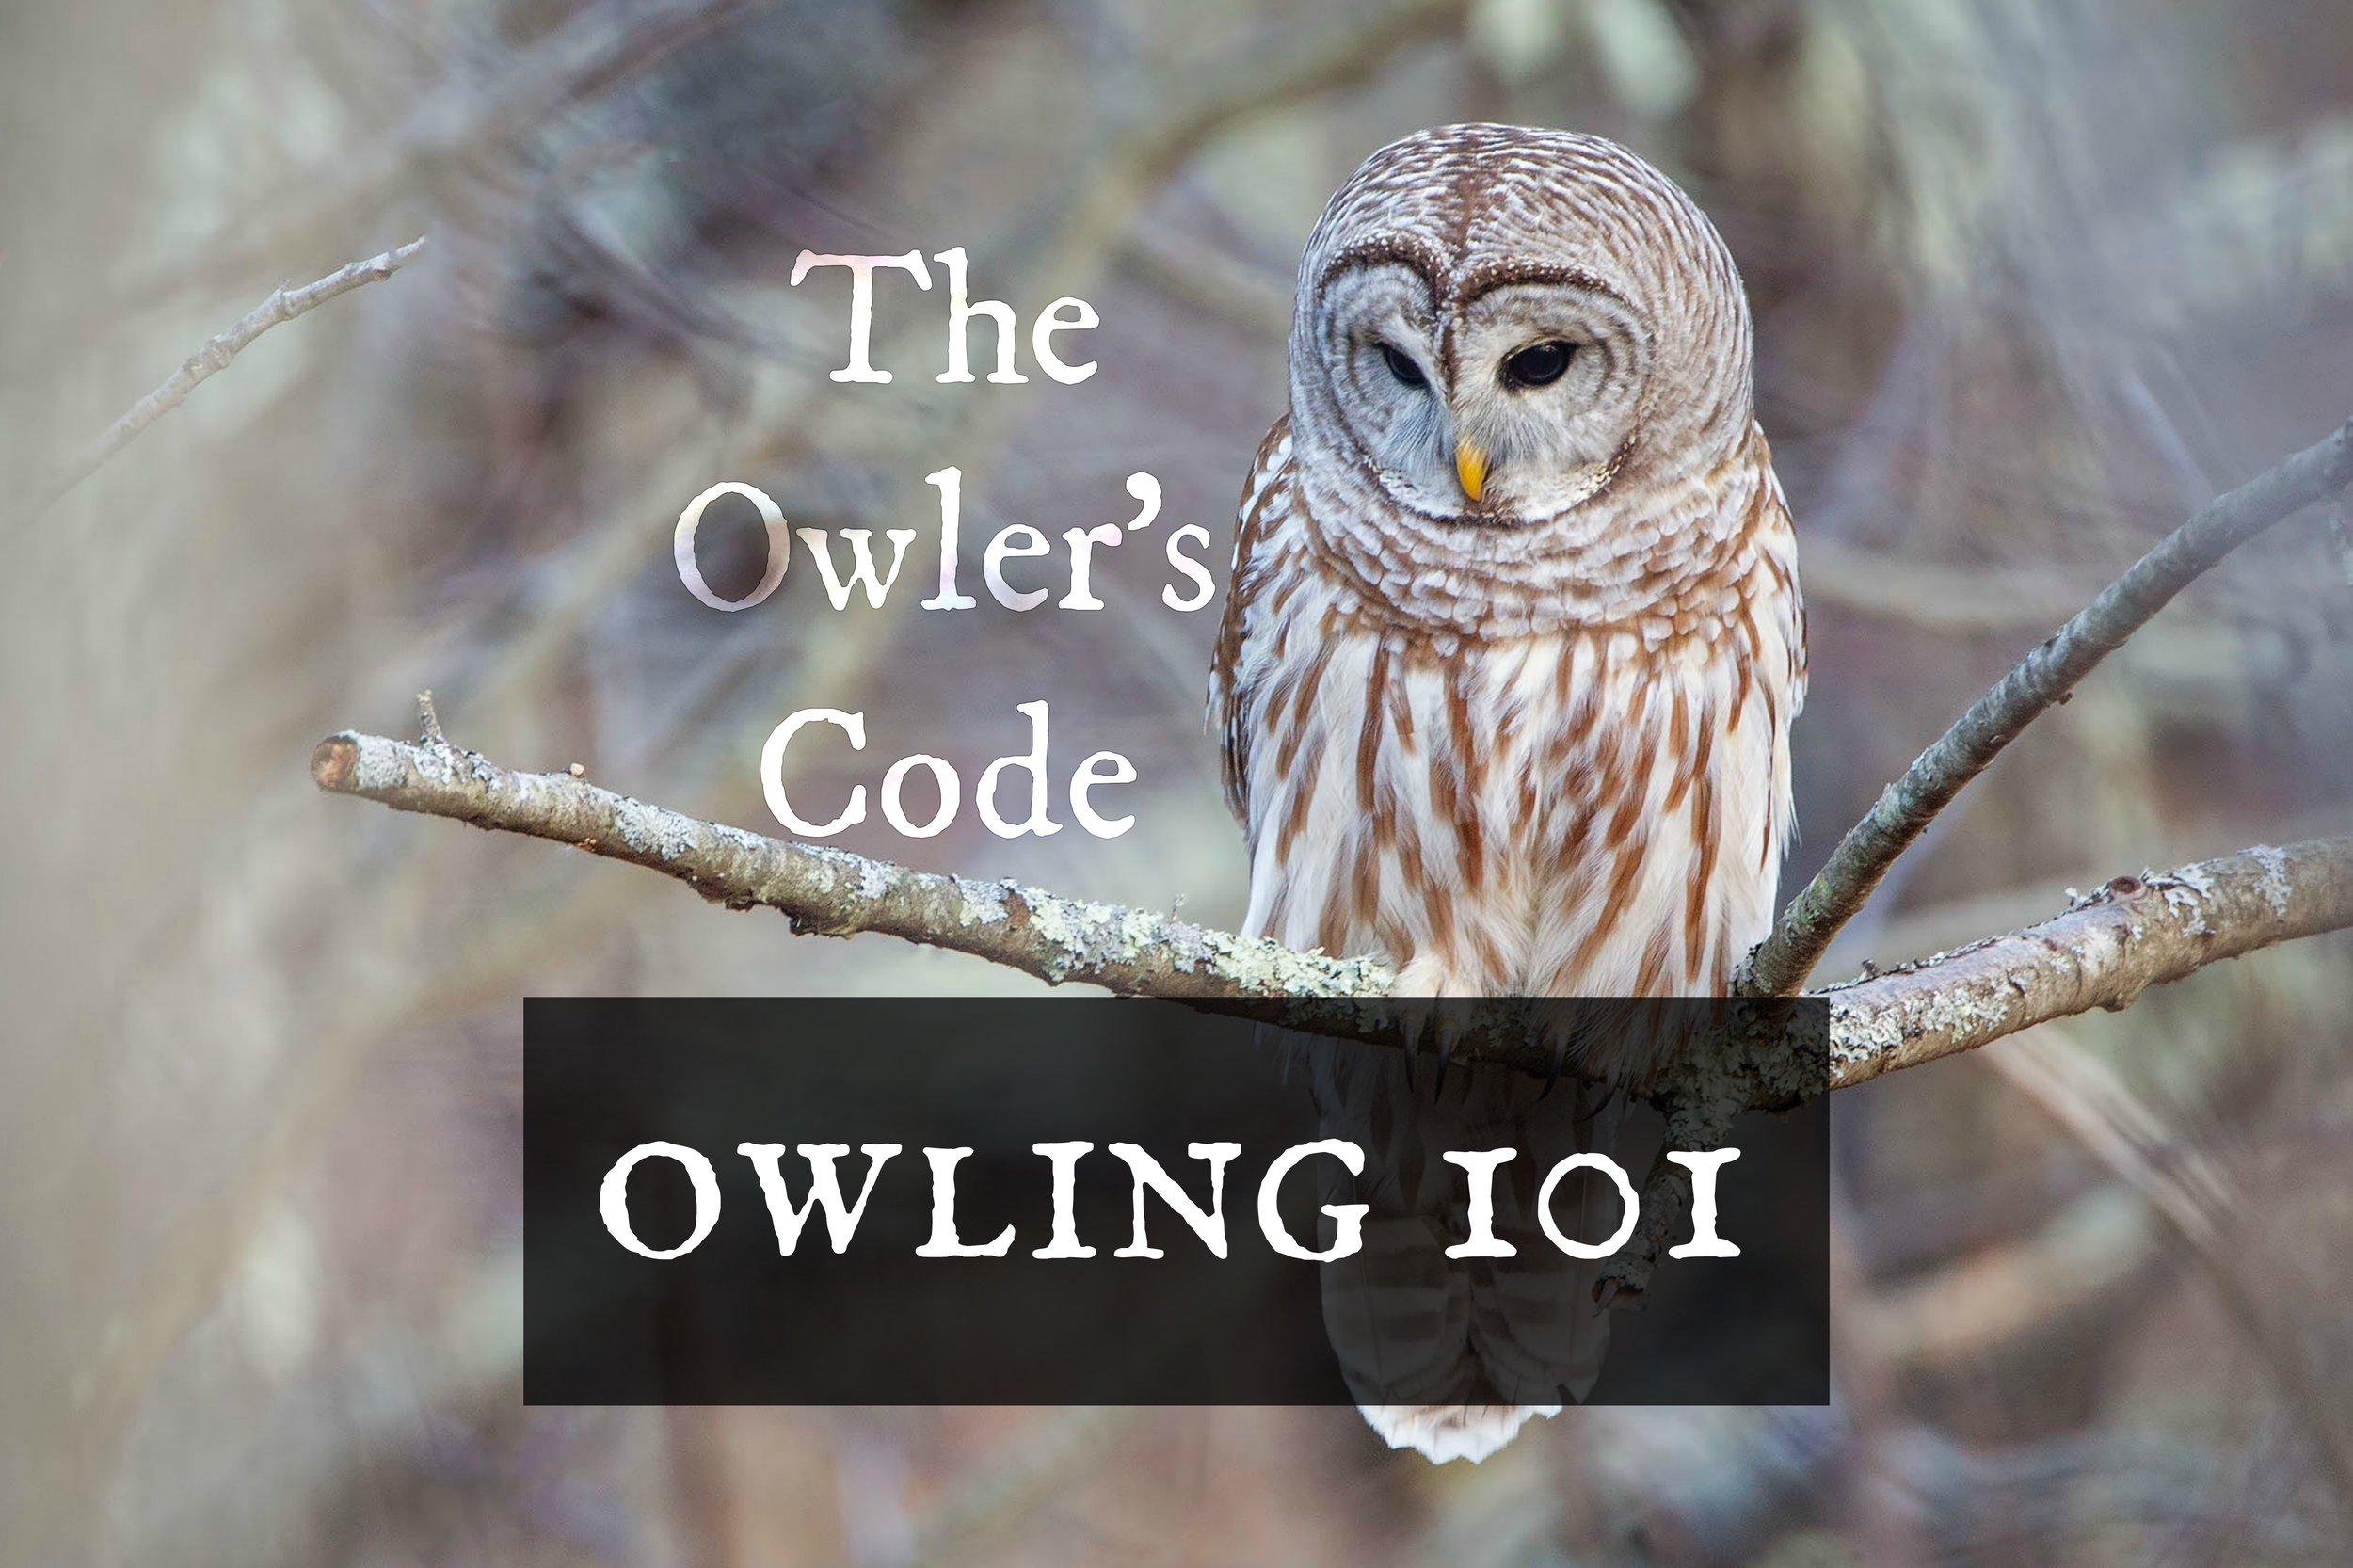 owling101-code.jpg